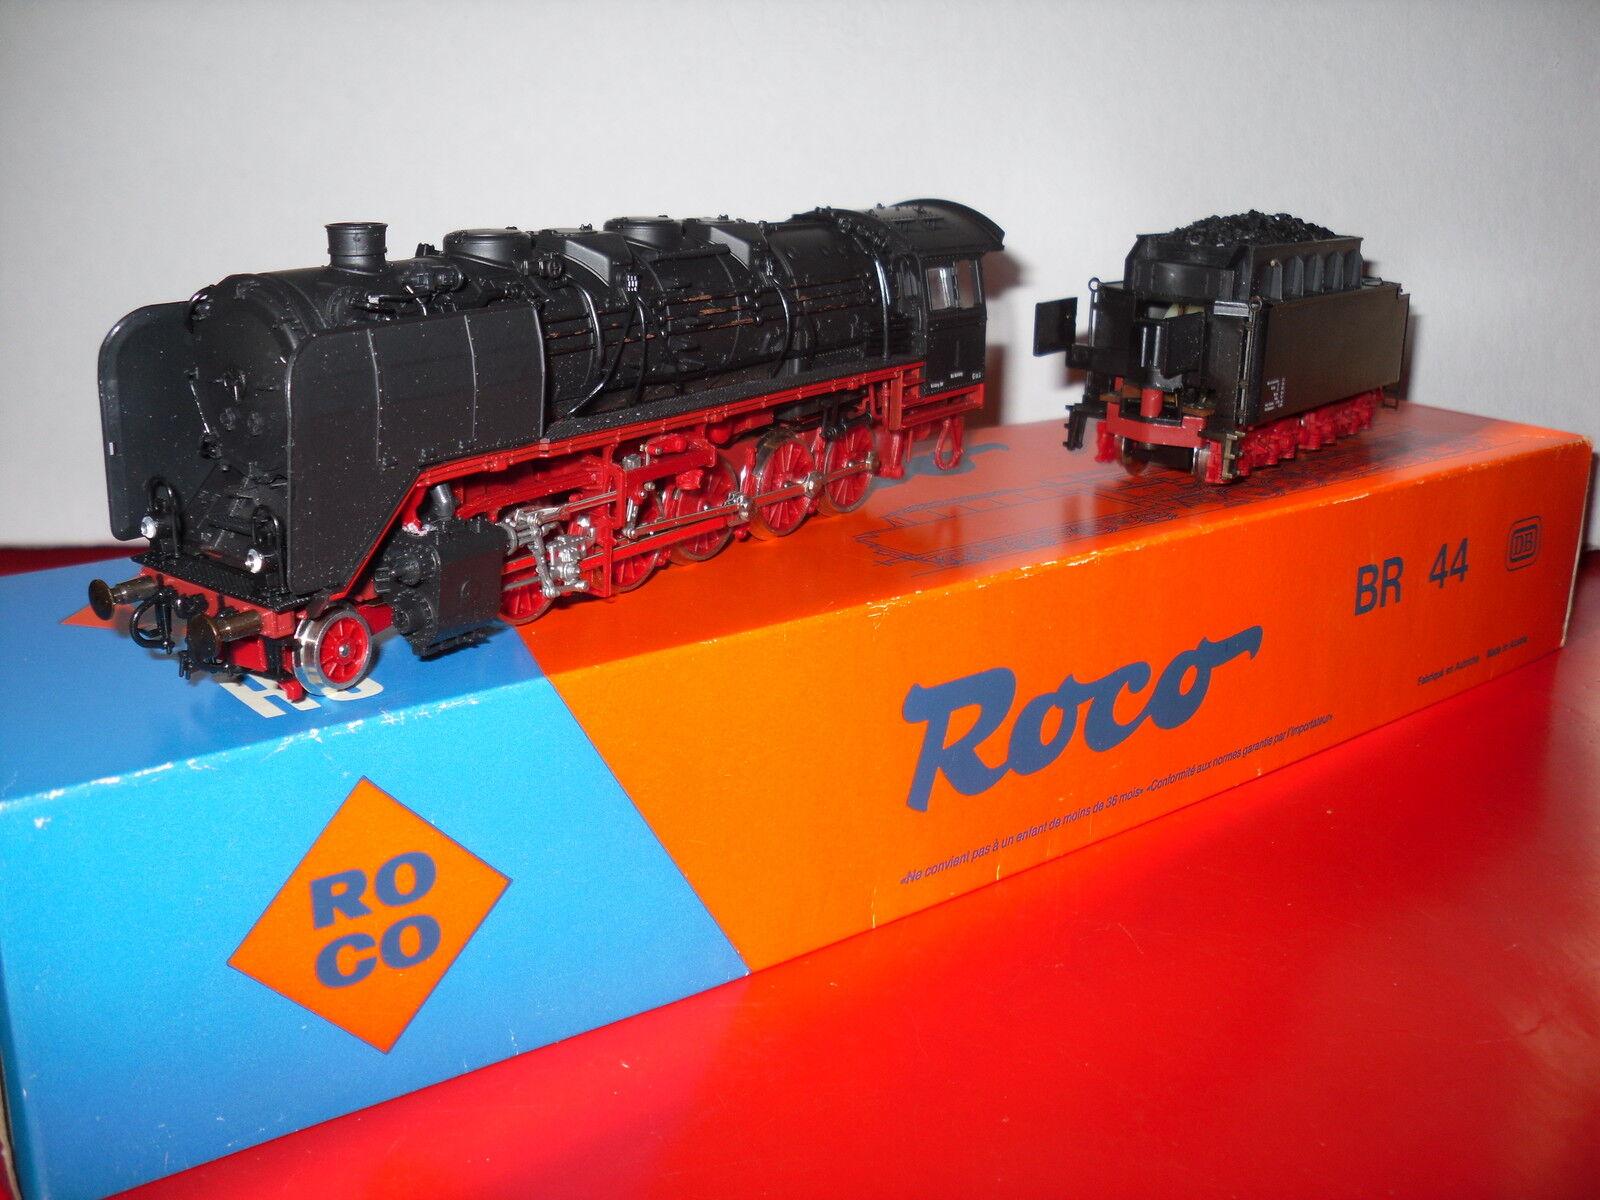 ROCO loco vapeur 150 BR 44 DB en  boite éch HO réf 04126B